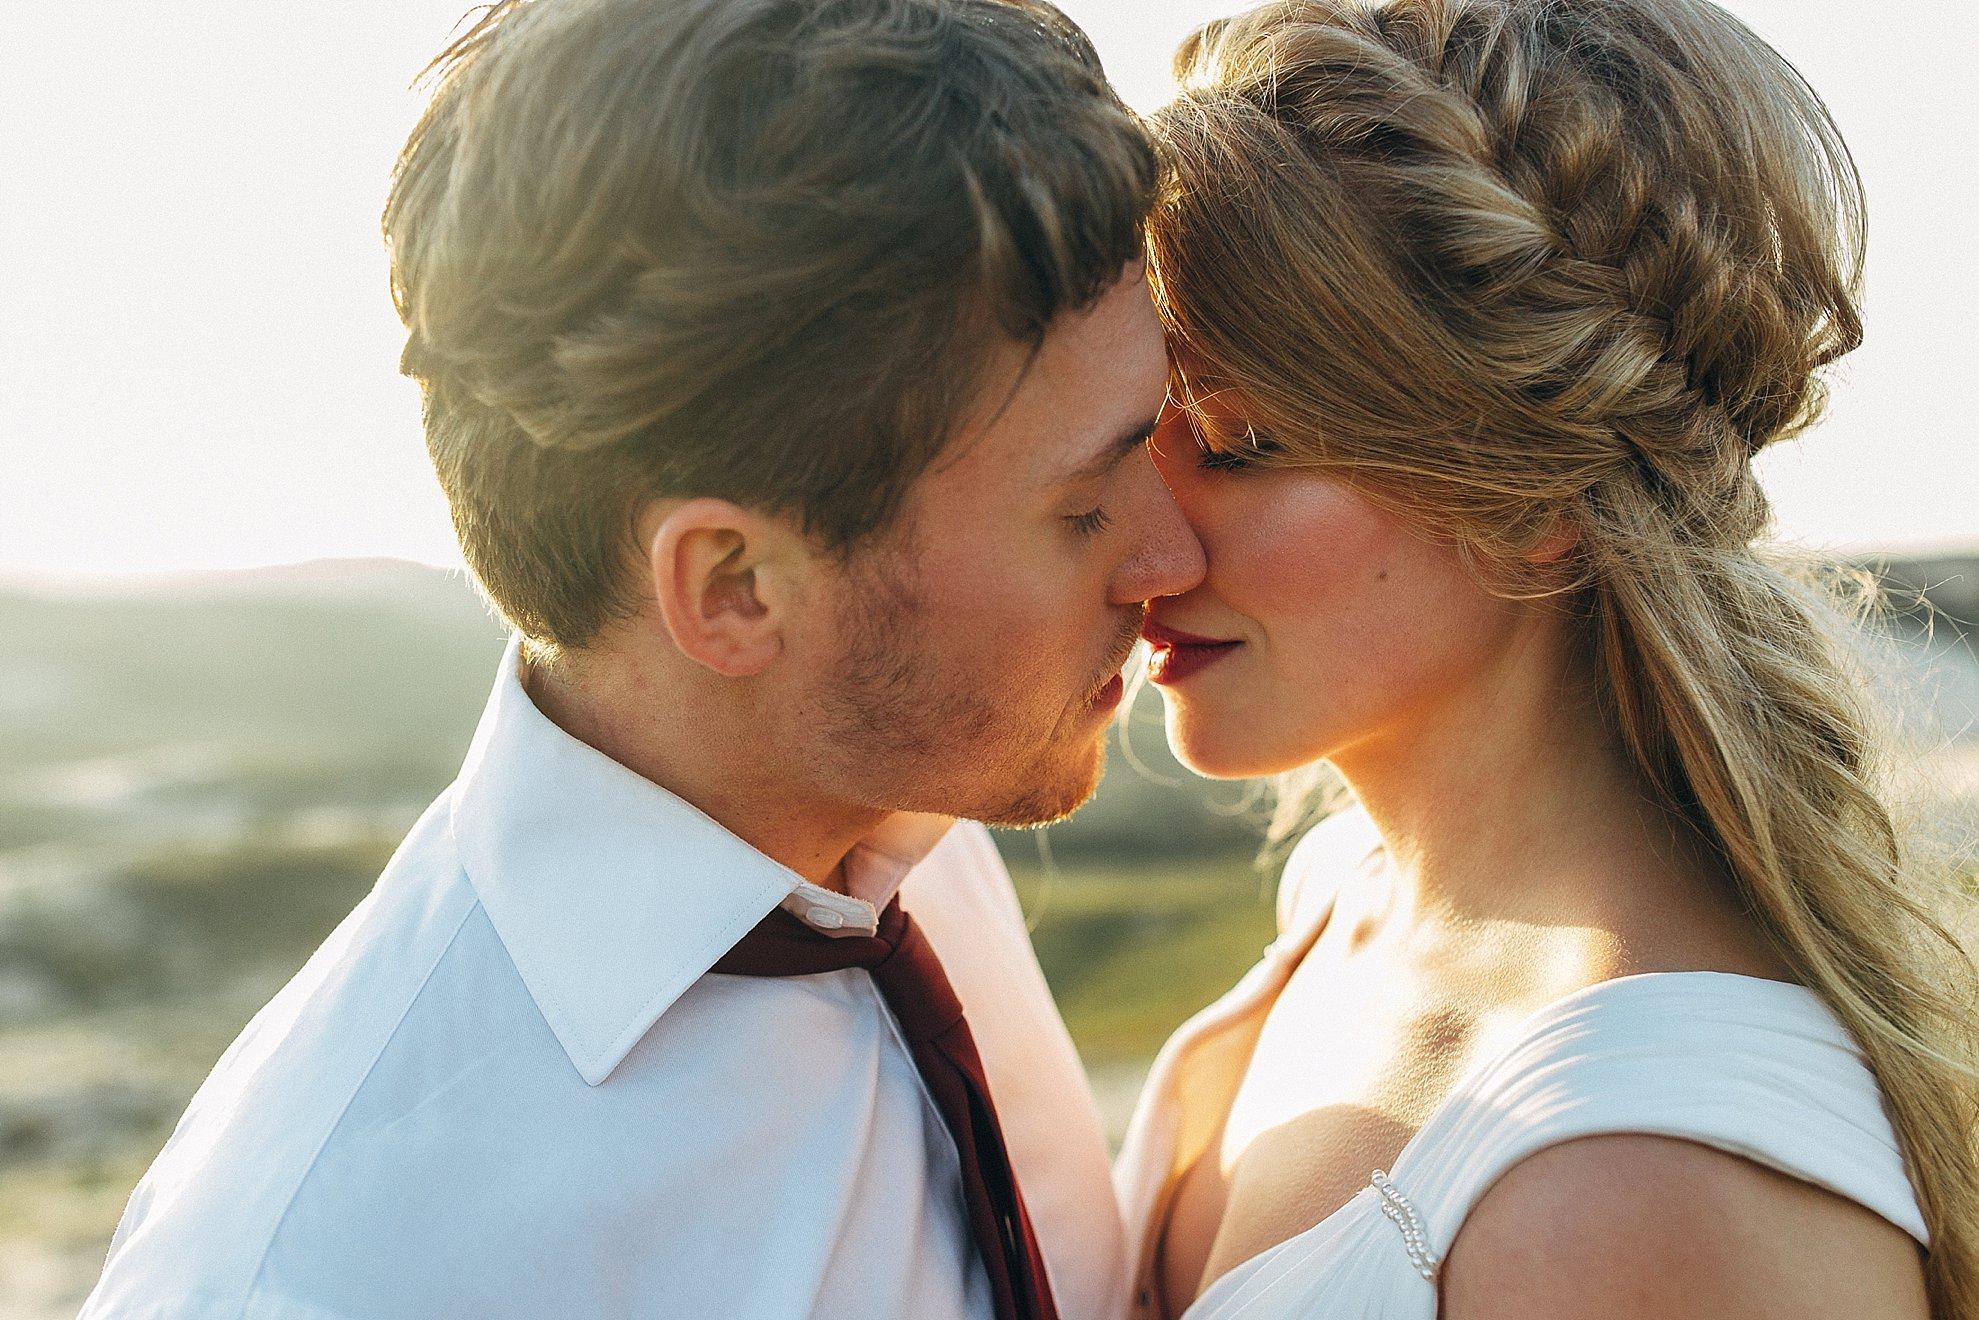 Vier-de-liefde-fotografie-Renkse-Meinema-fotografie_0009